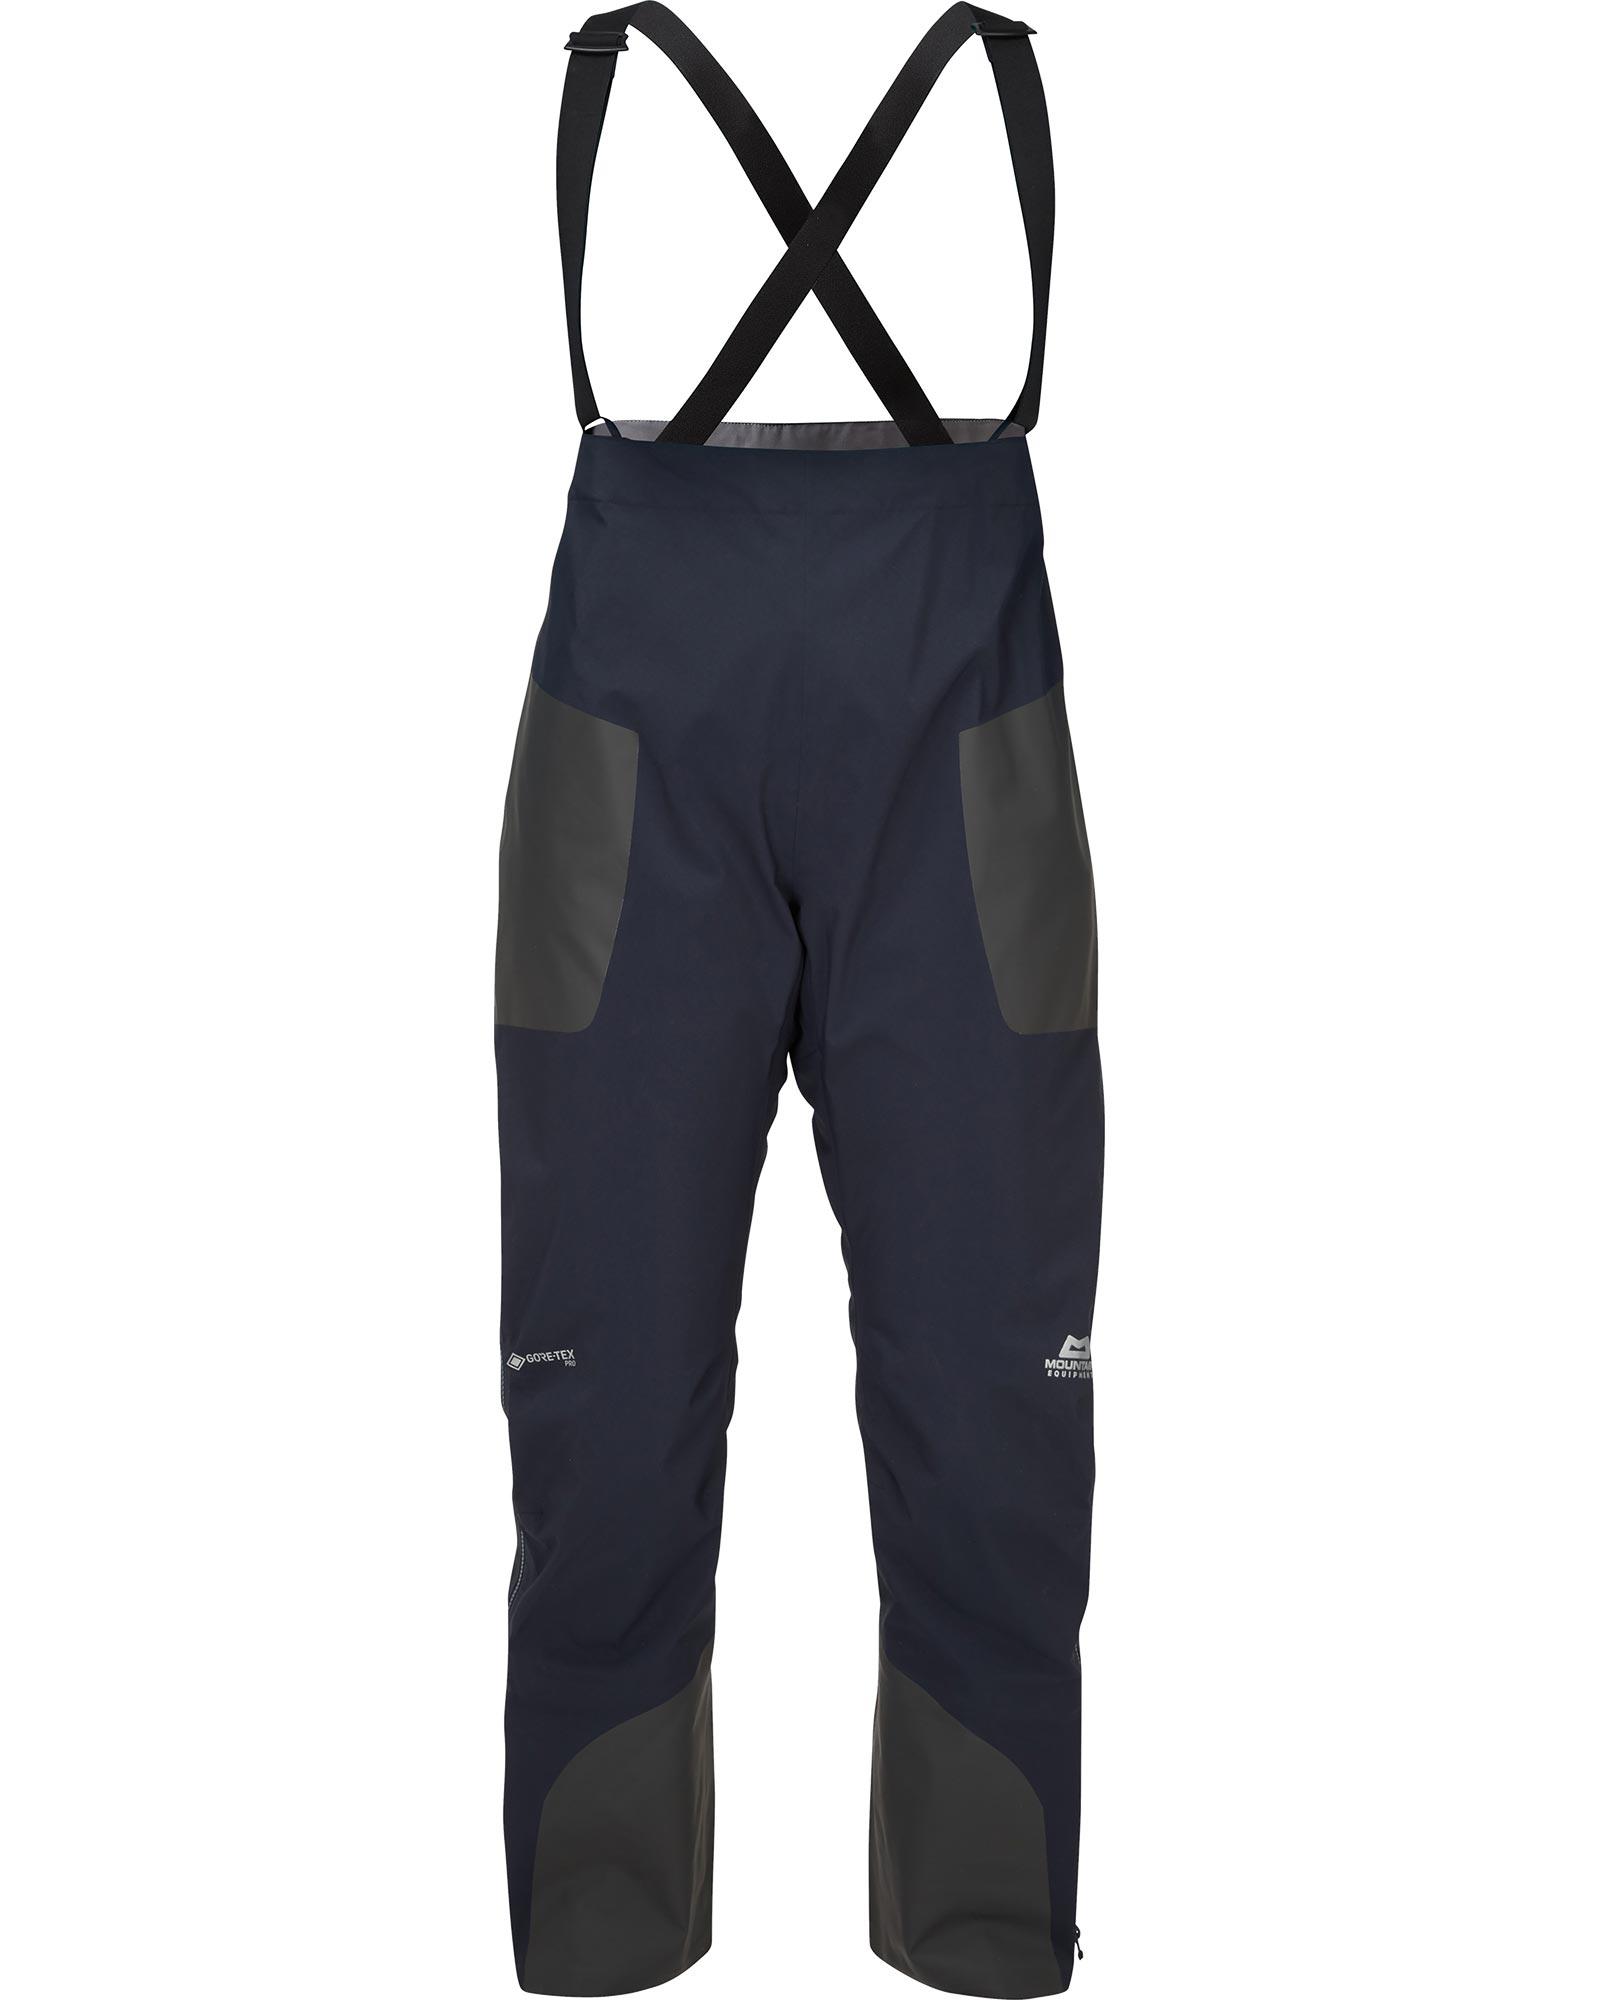 Mountain Equipment Women's Tupilak GORE-TEX Pro Pants 0